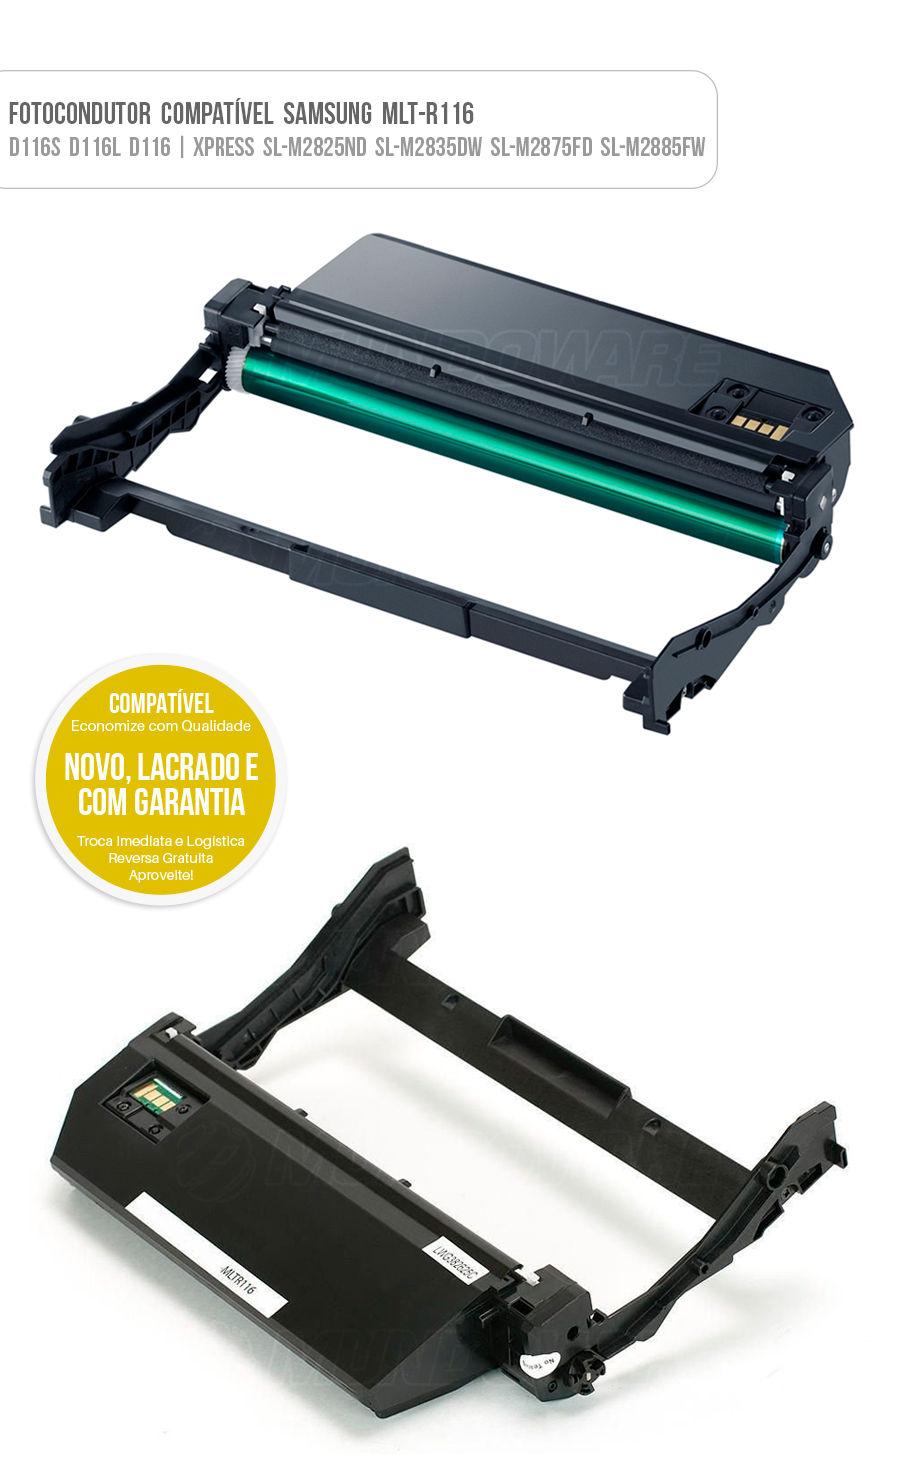 Drum Fotocondutor Tambor de Imagem Unidade Cilindro Kit DR Samsung R116 D116